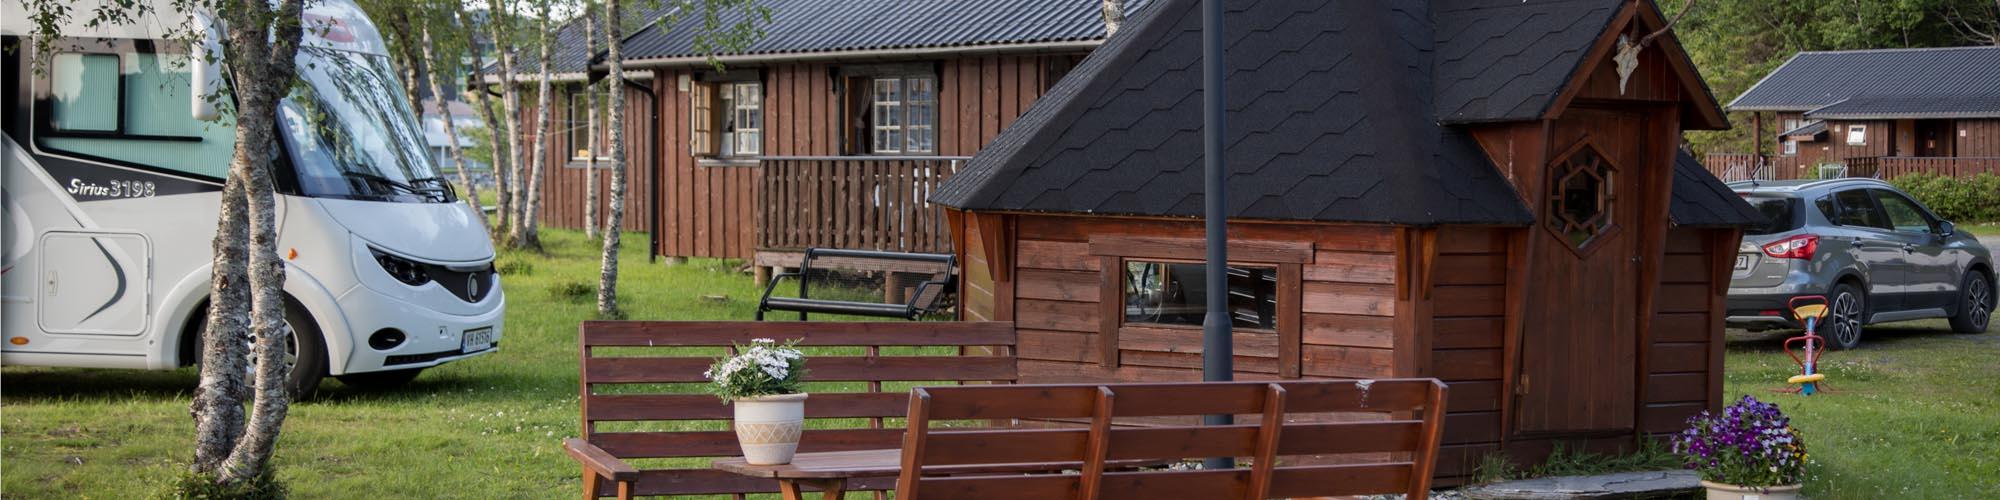 Åfjord Laksecamping 2017